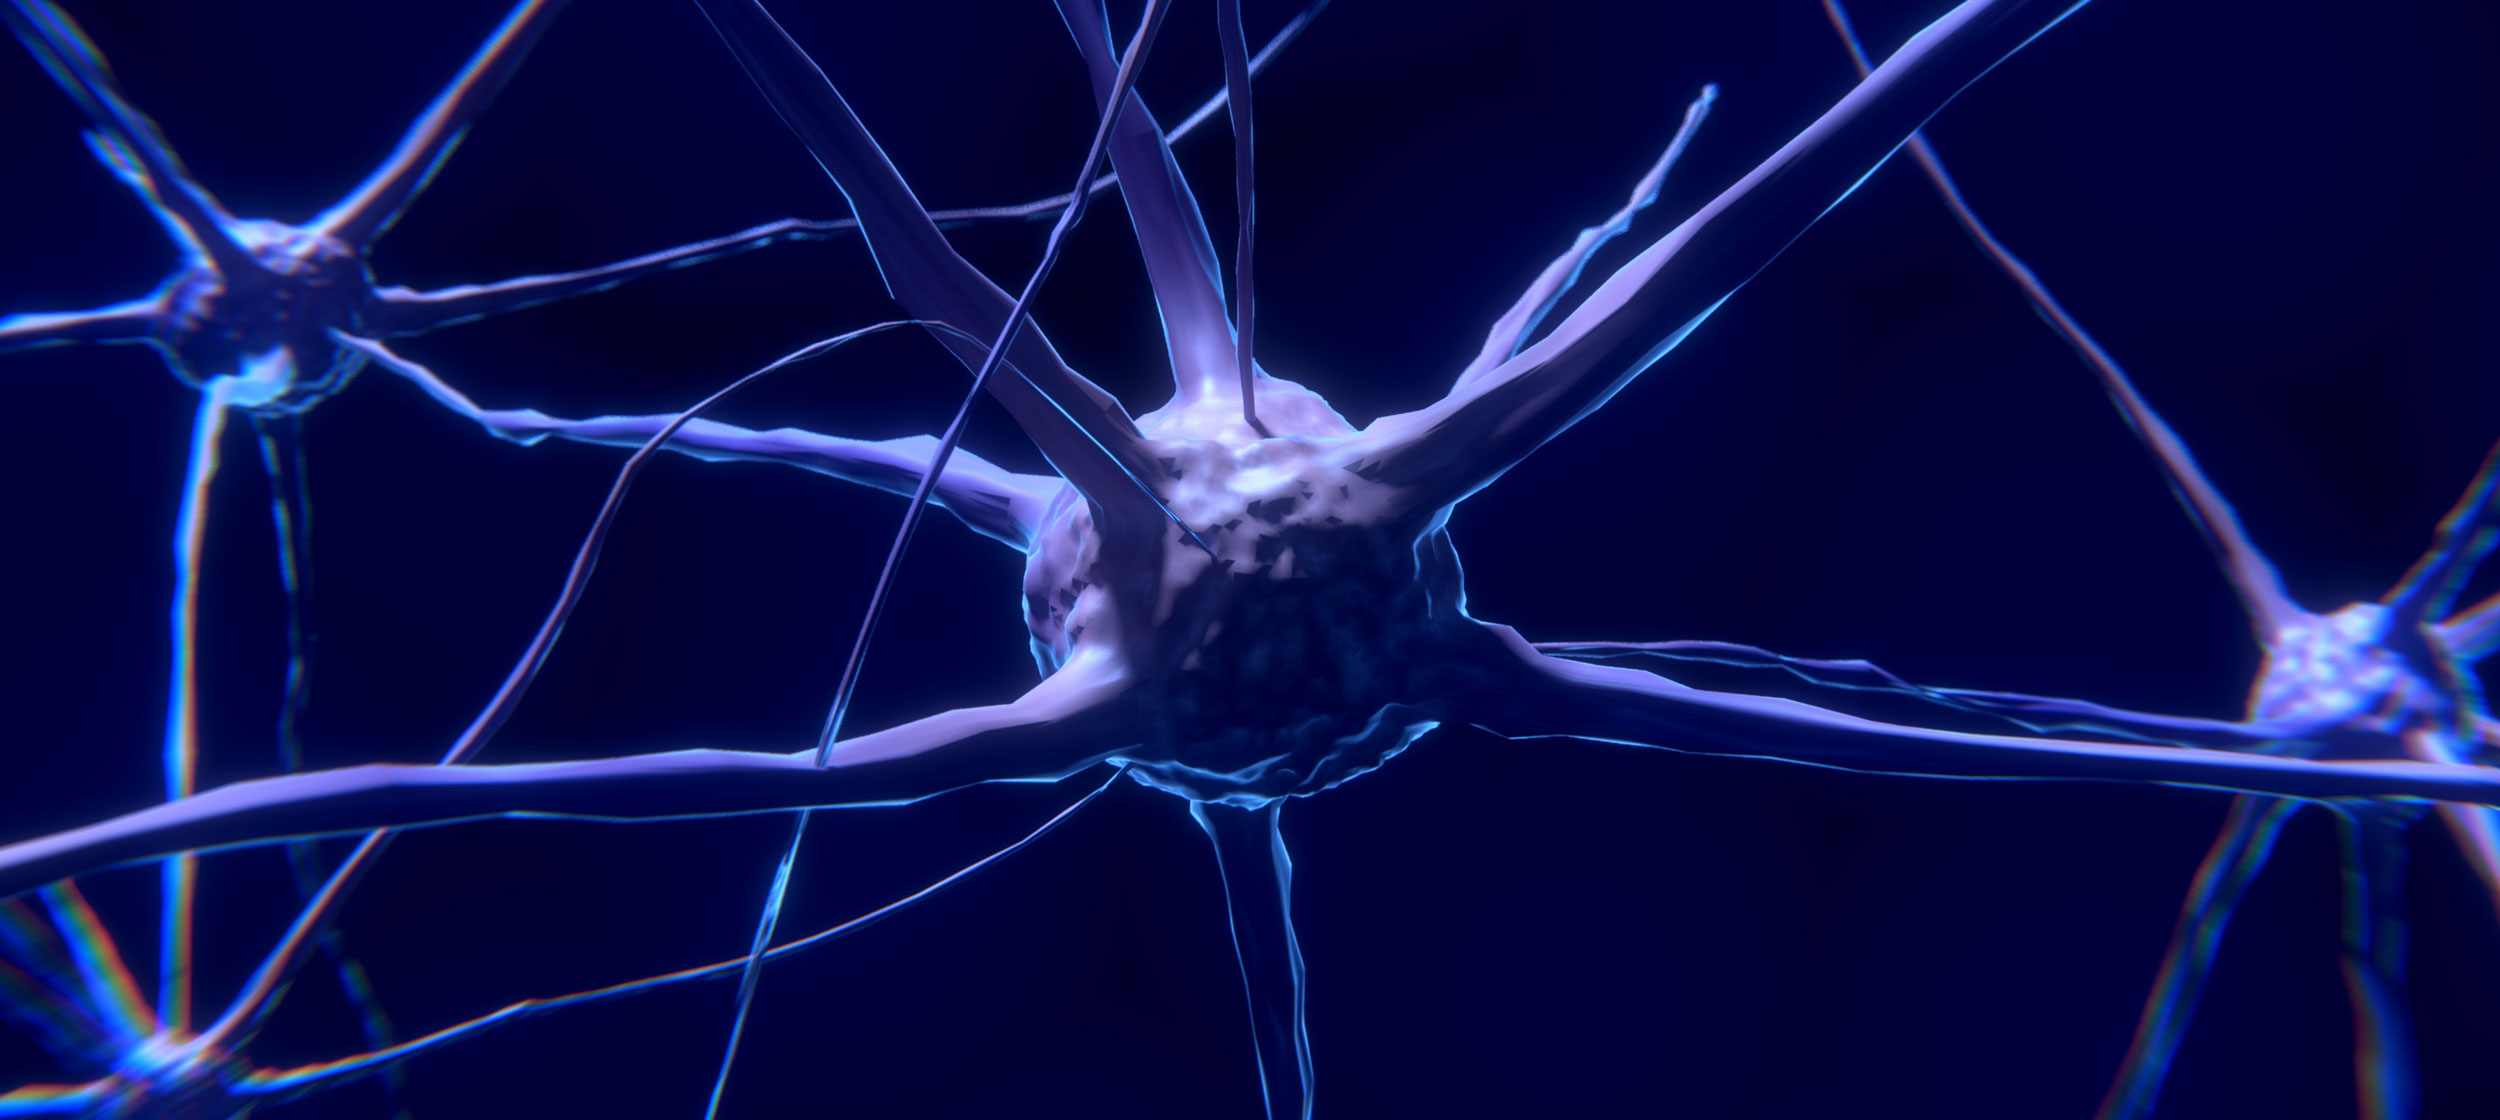 Neuron / Nerve